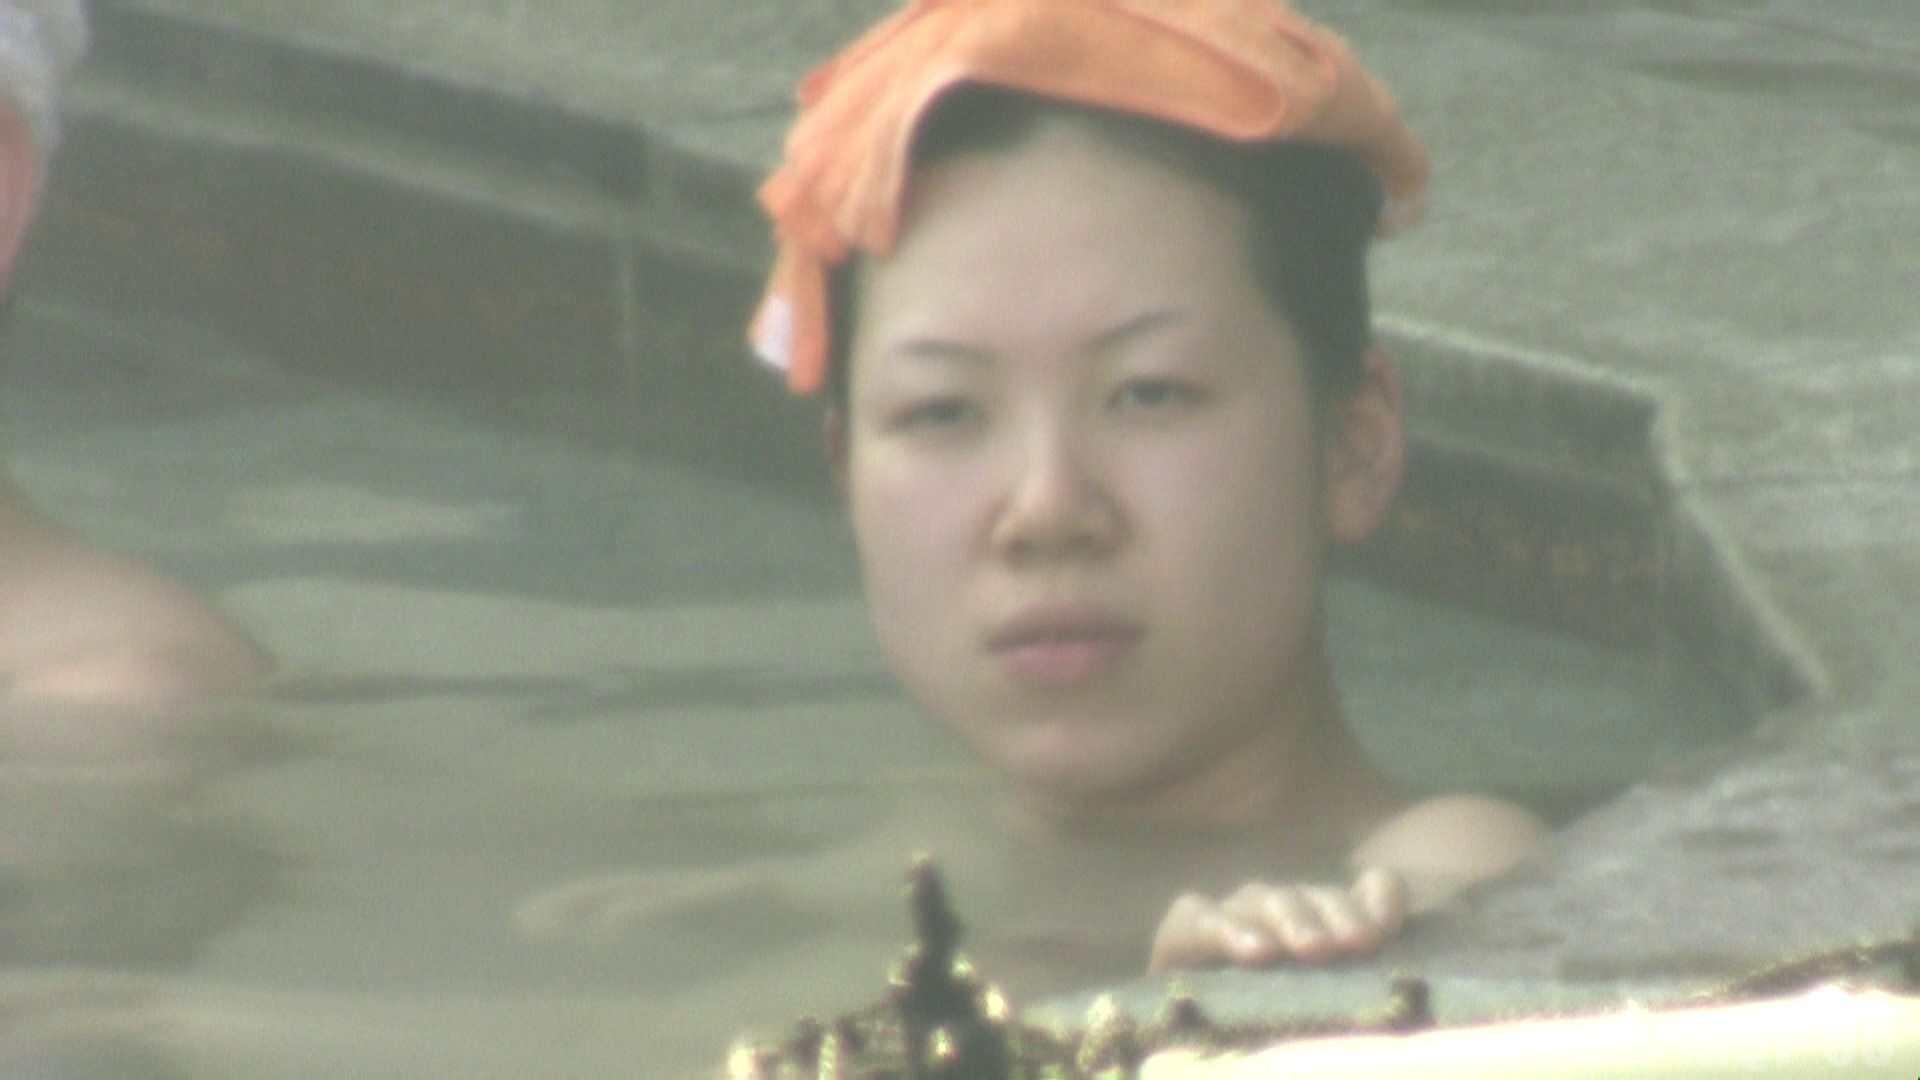 Aquaな露天風呂Vol.778 露天 | OLのプライベート  10pic 4